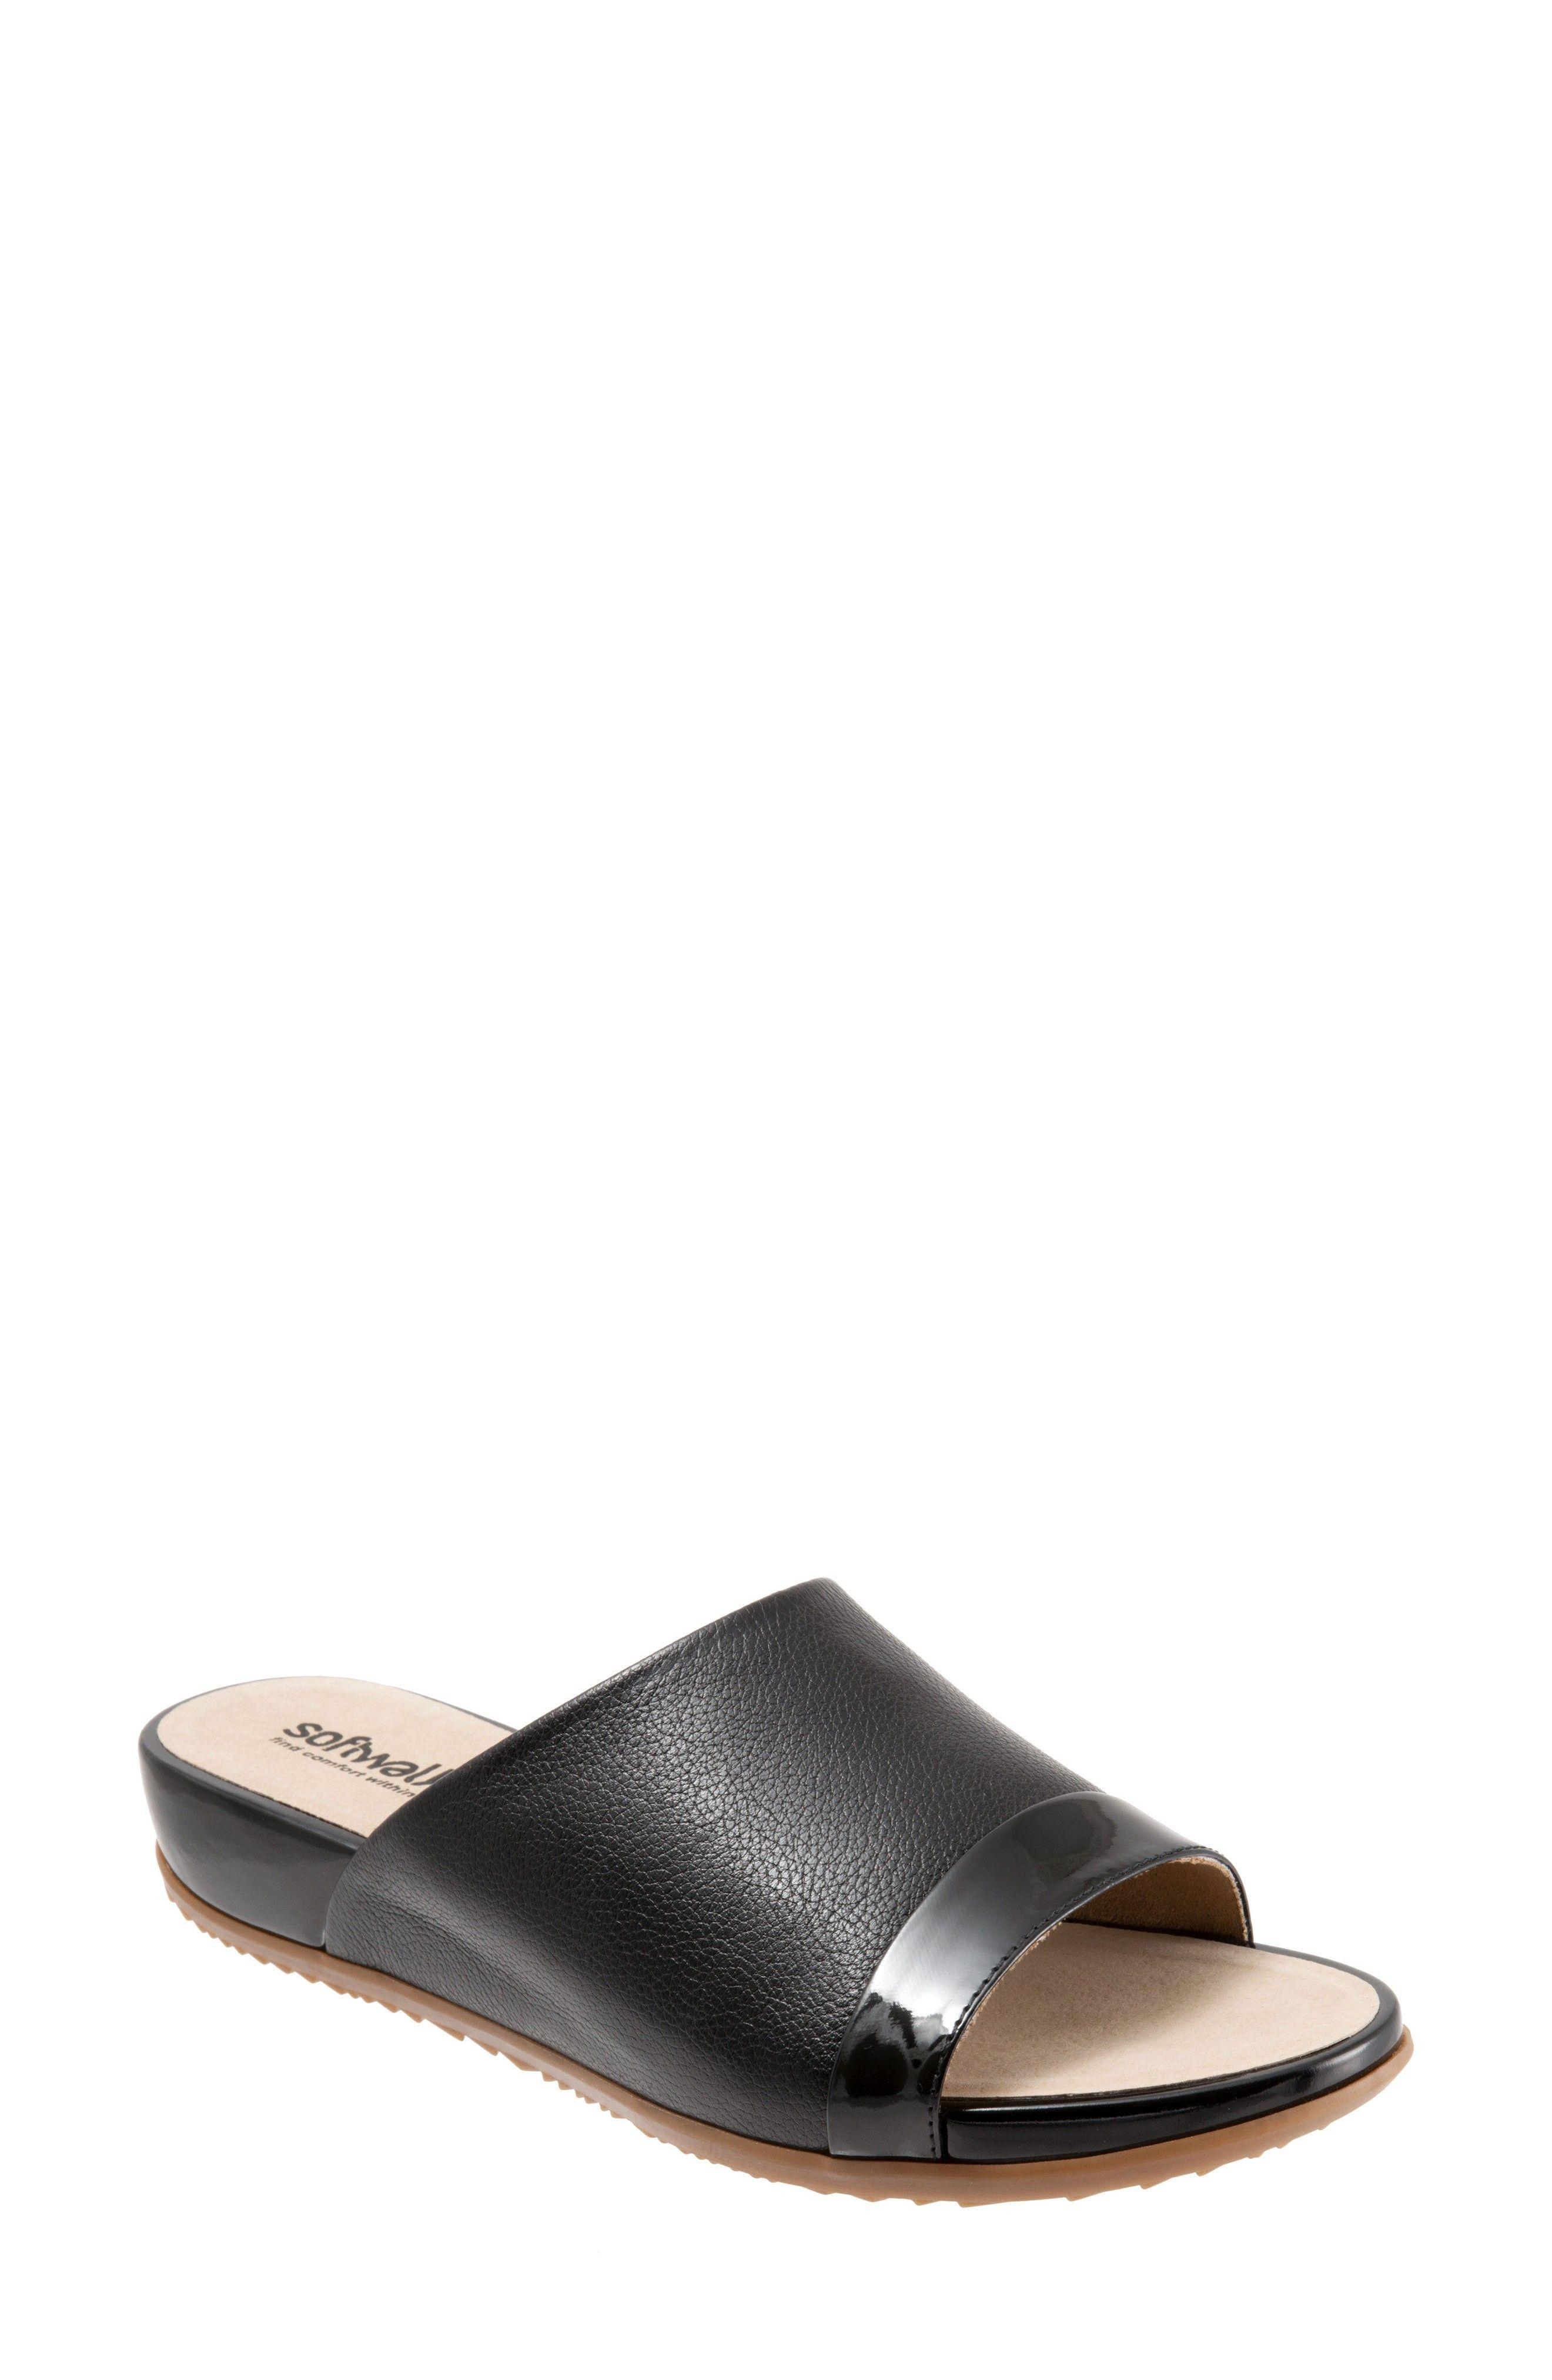 Softwalk Del Mar Slide Sandals PMq3N